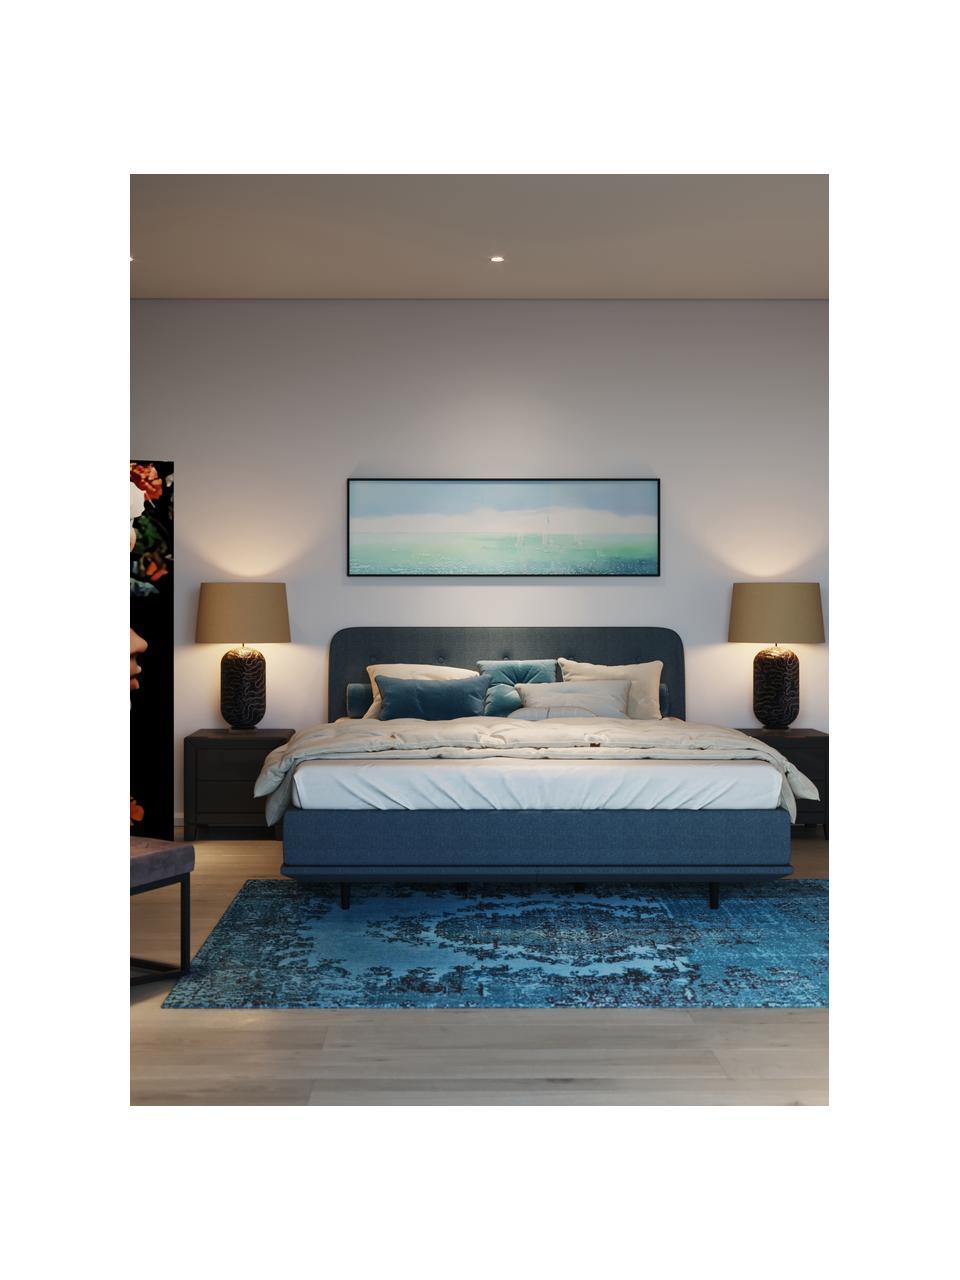 Polsterbett Luna in Blau, Korpus: Massives Buchenholz, lack, Bezug: 100% Polyester, Füße: Massives Buchenholz, lack, Webstoff Blau, 180 x 200 cm